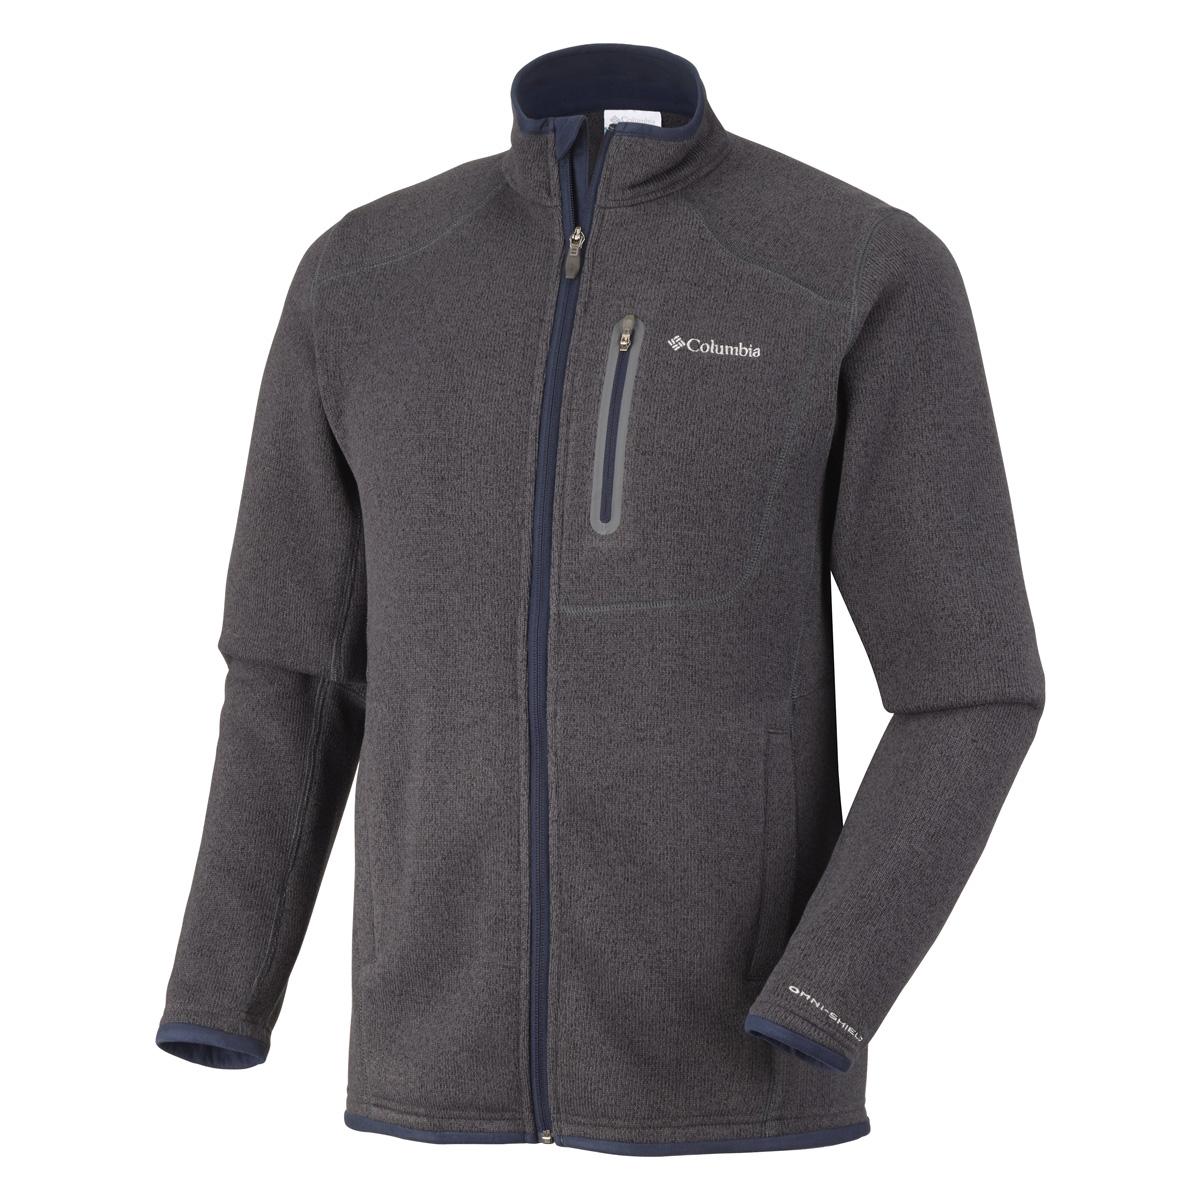 Columbia Altitude Aspect Full Zip Fleece - Mens - India Ink ...